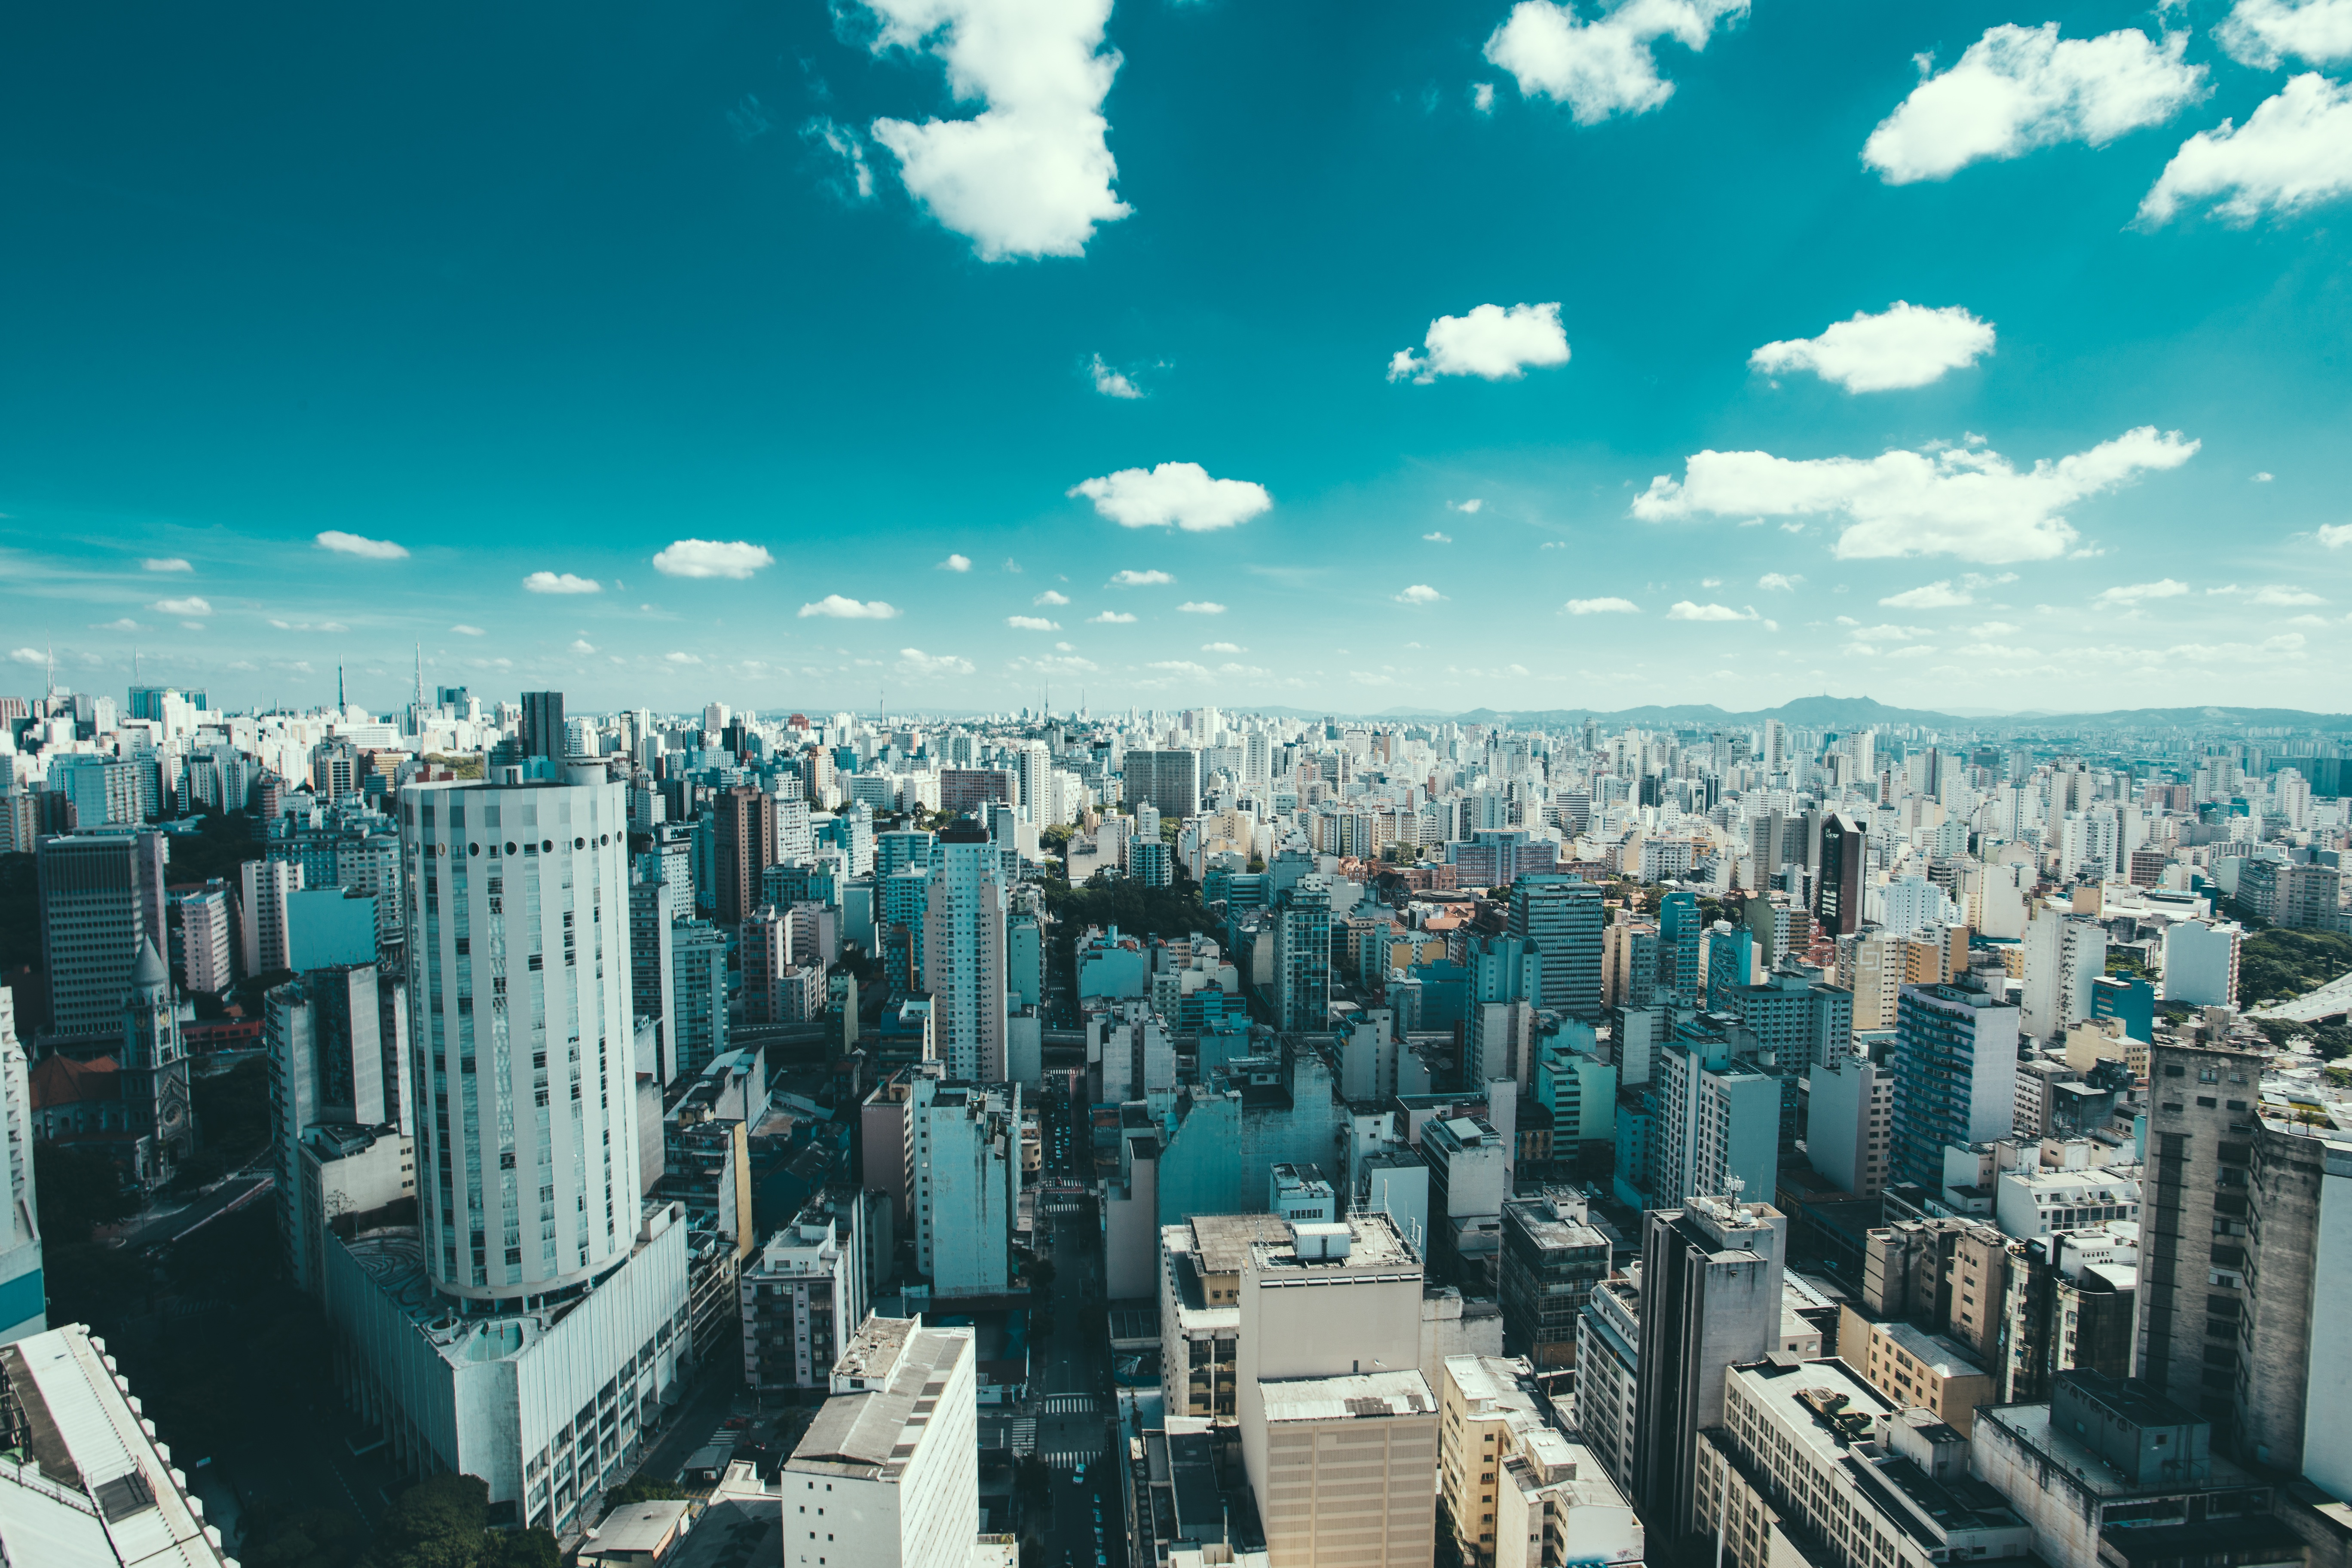 Lins - São Paulo